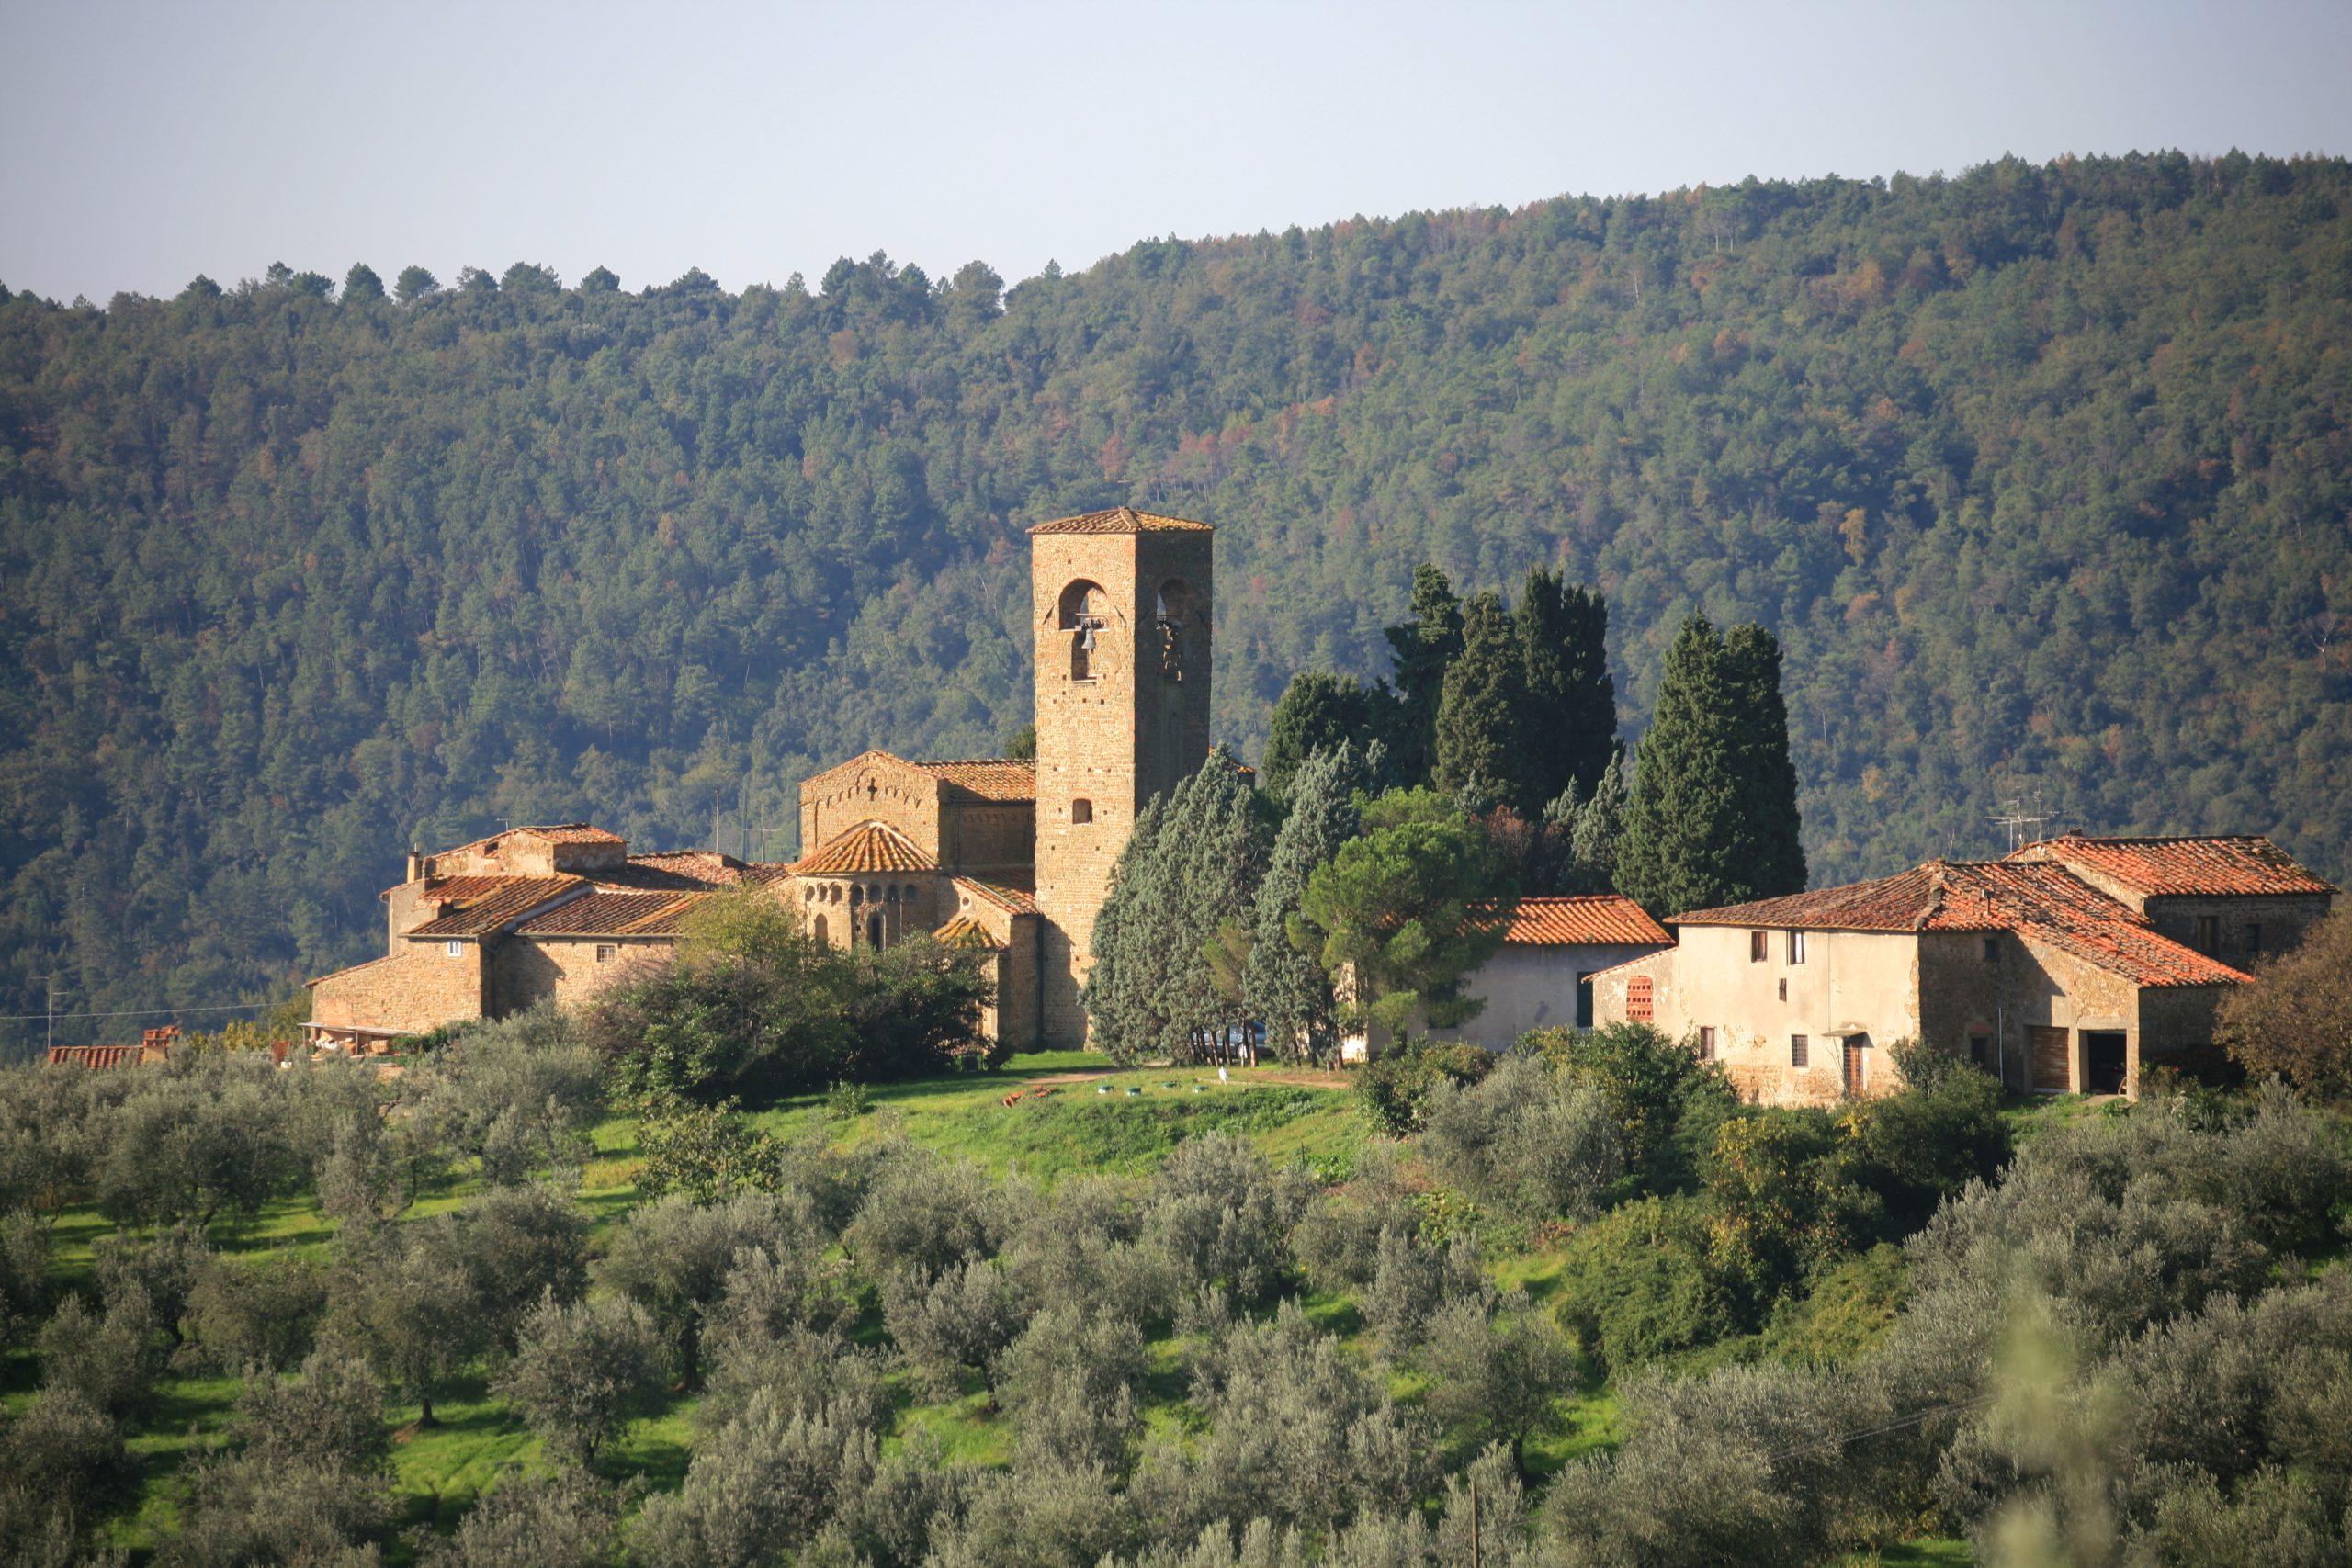 Pieve San Leonardo